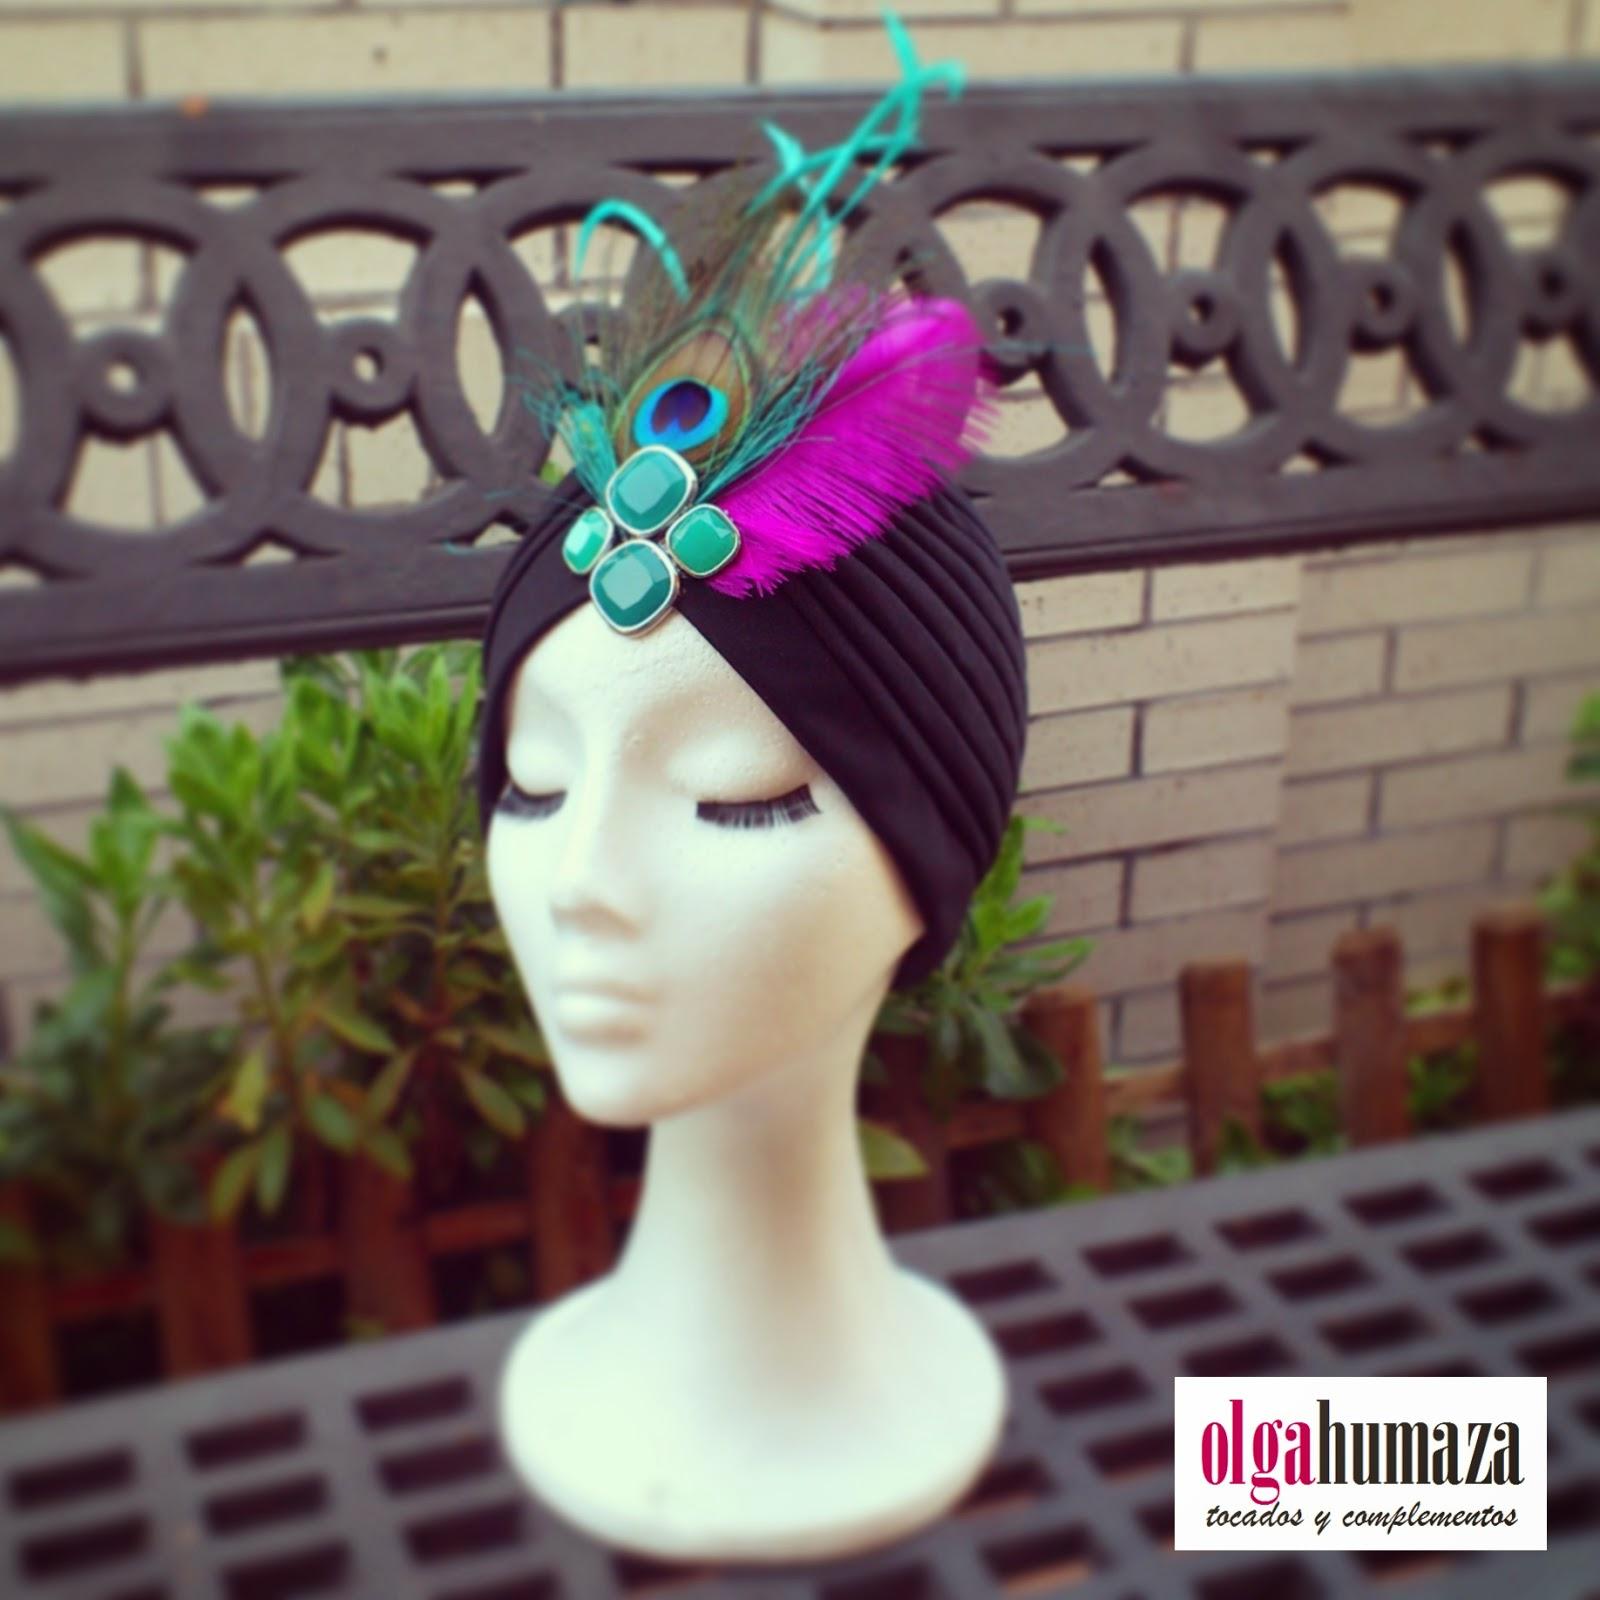 http://olgahumaza.blogspot.com.es/2015/02/b48-tocado-turbante-negro-y-adorno-de.html